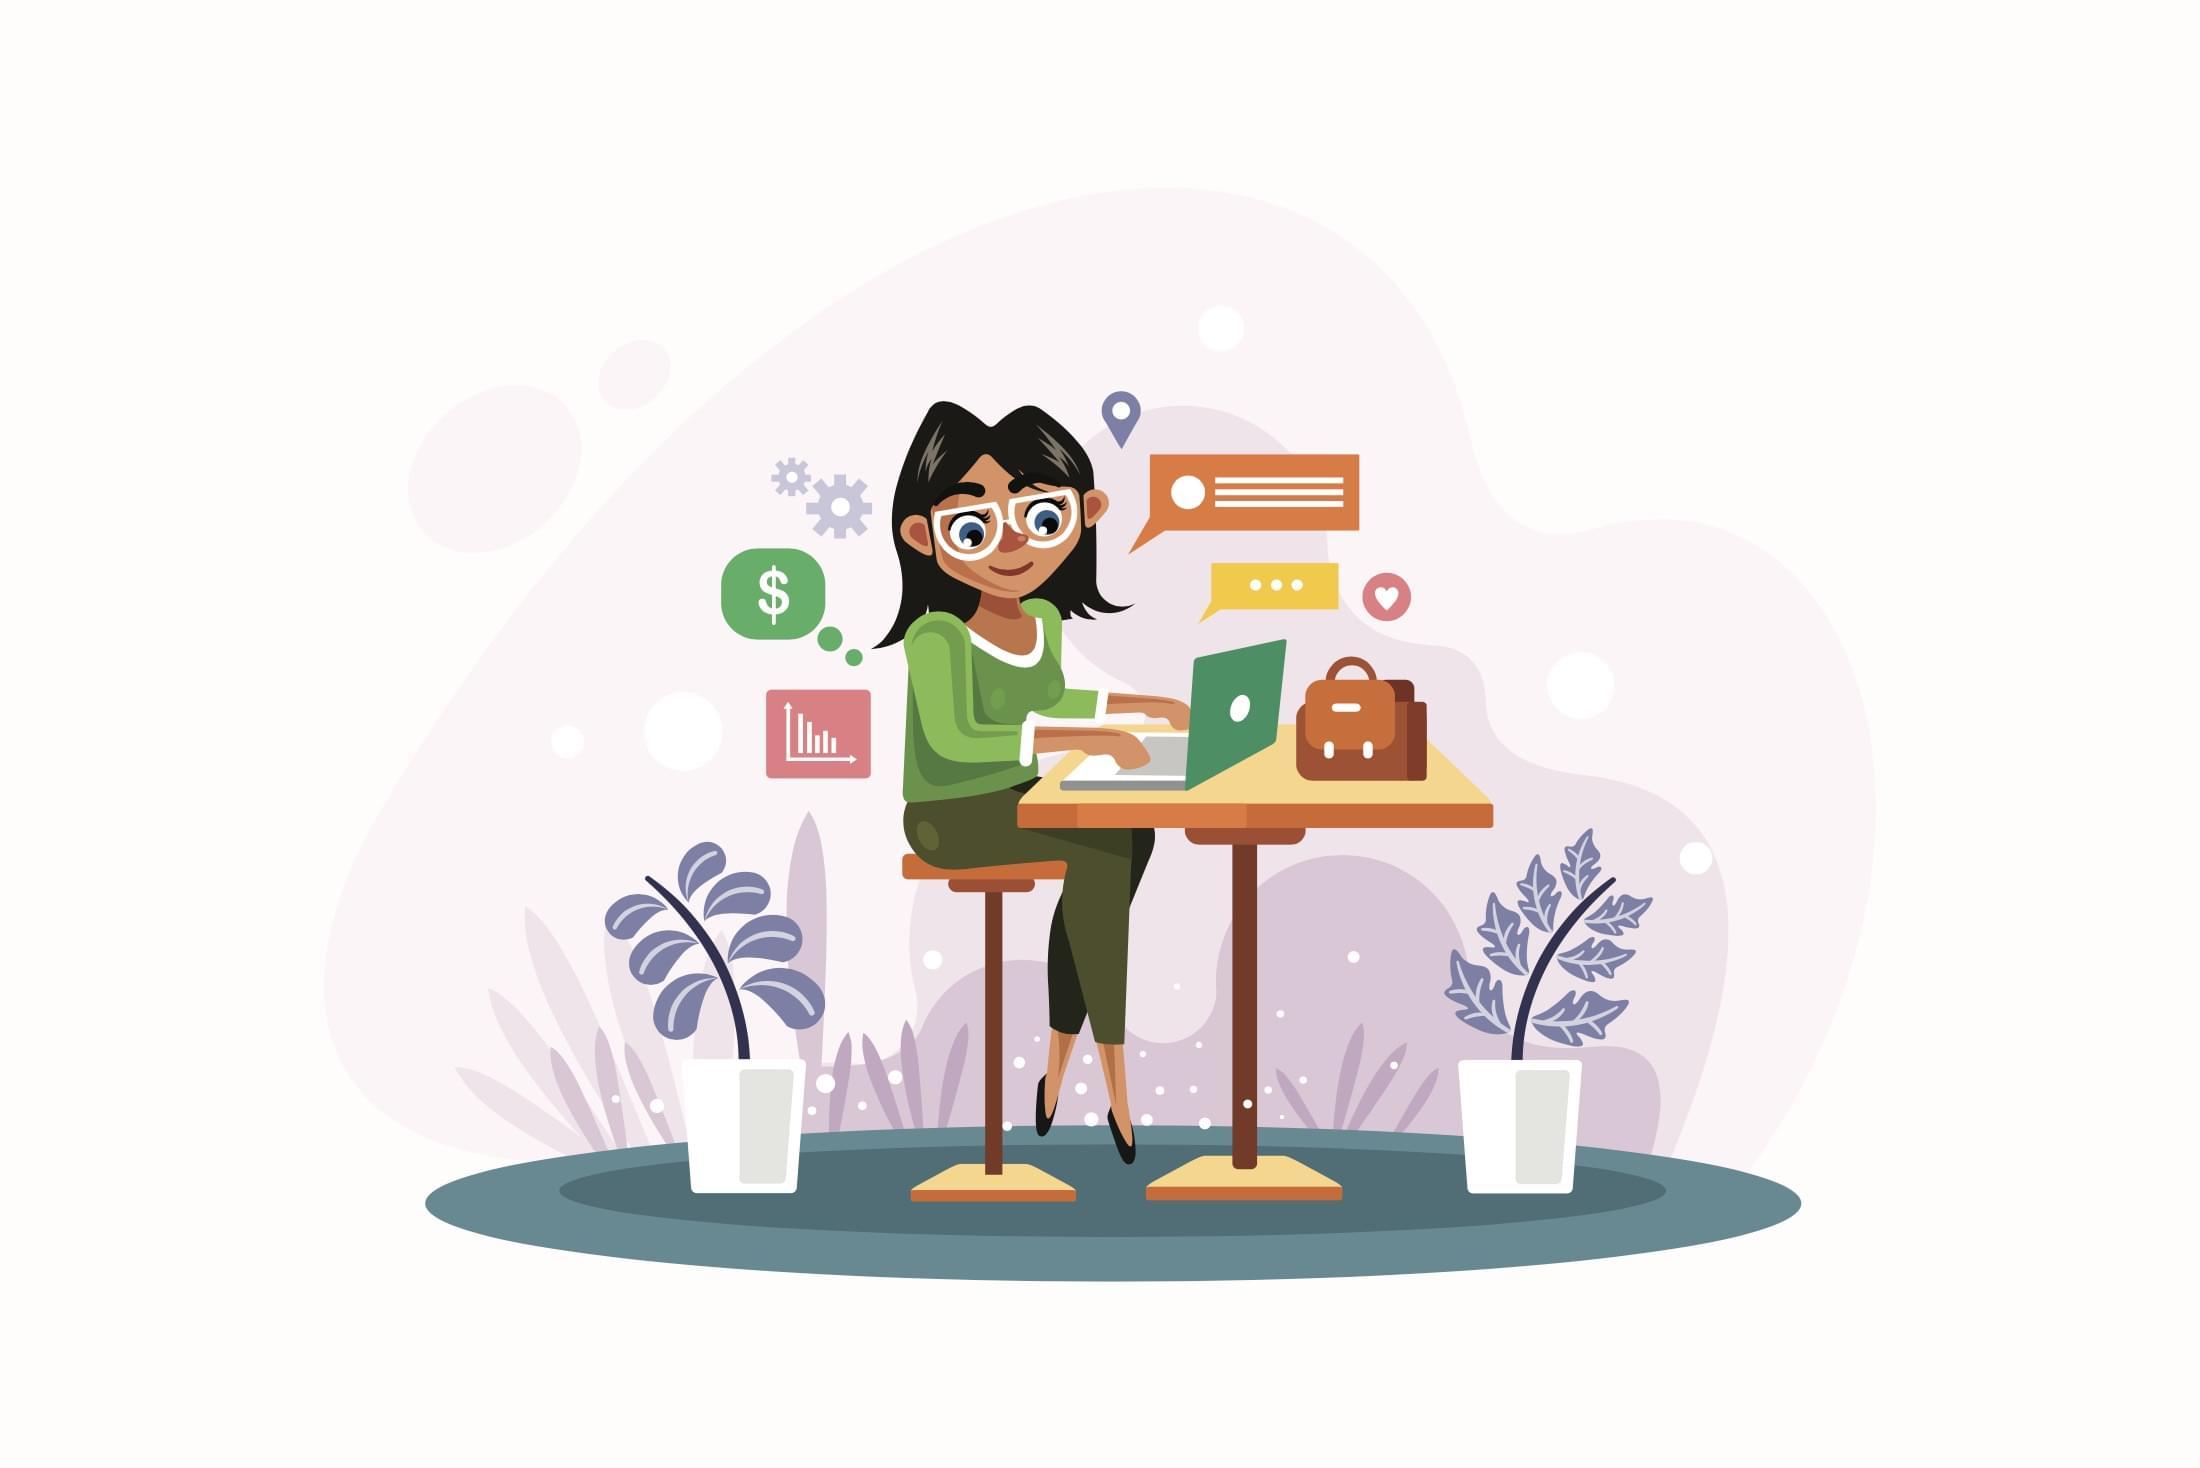 How to Prepare for a Remote Job Search — SitePoint نکات مهمی که قبل از استخدام نیروی دورکار باید مد نظر قرار دهید اخبار IT